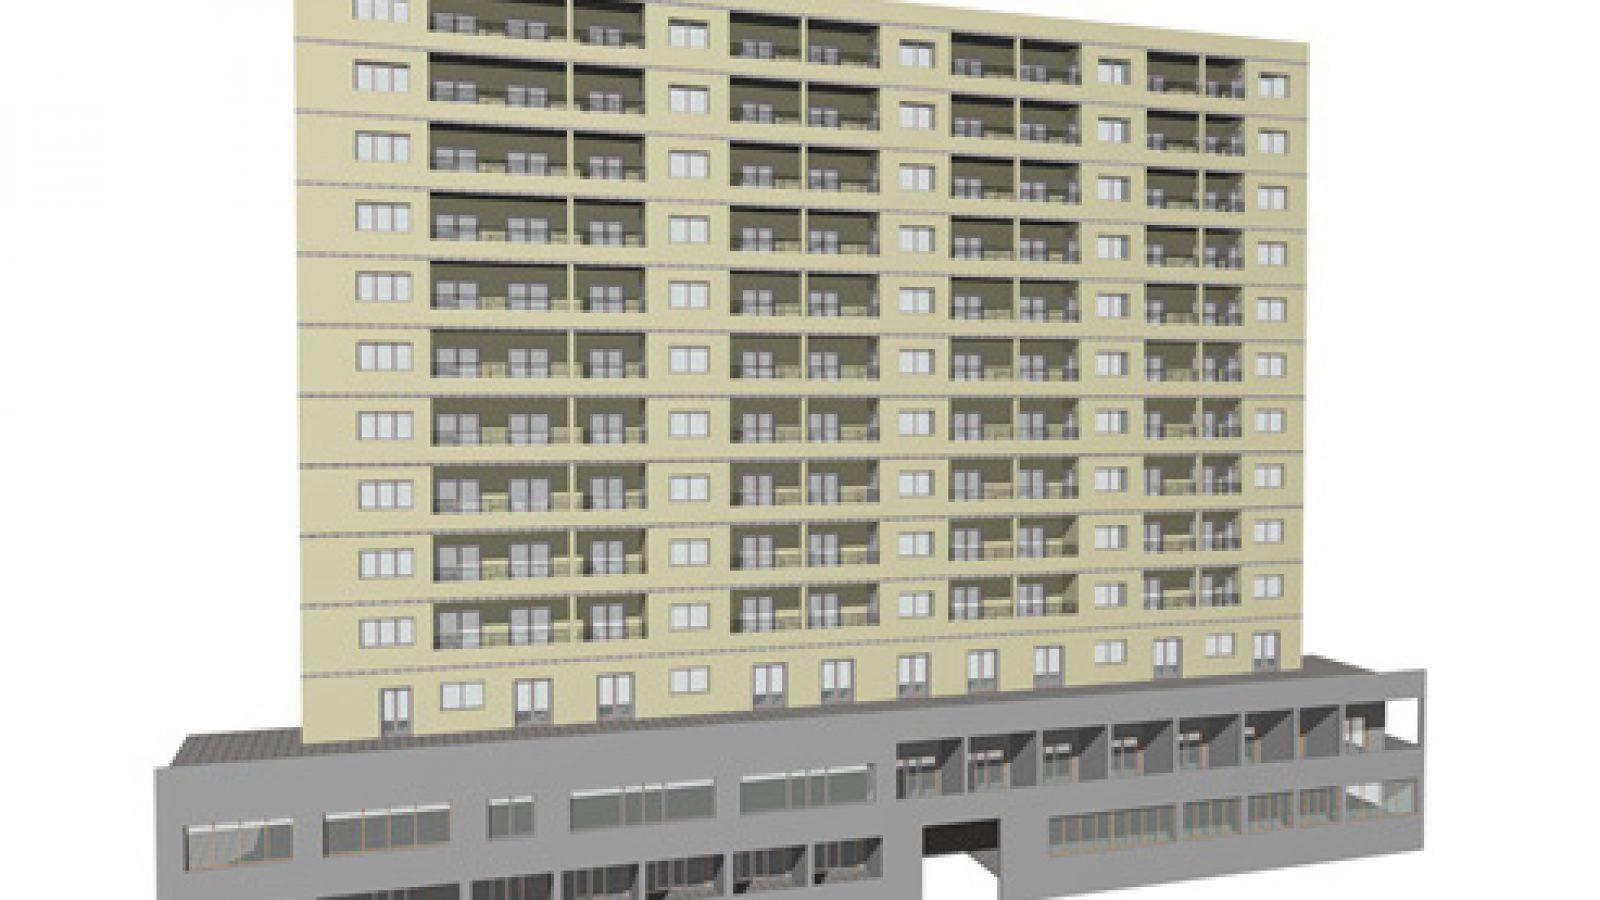 Modelo BIM hotel andalucia